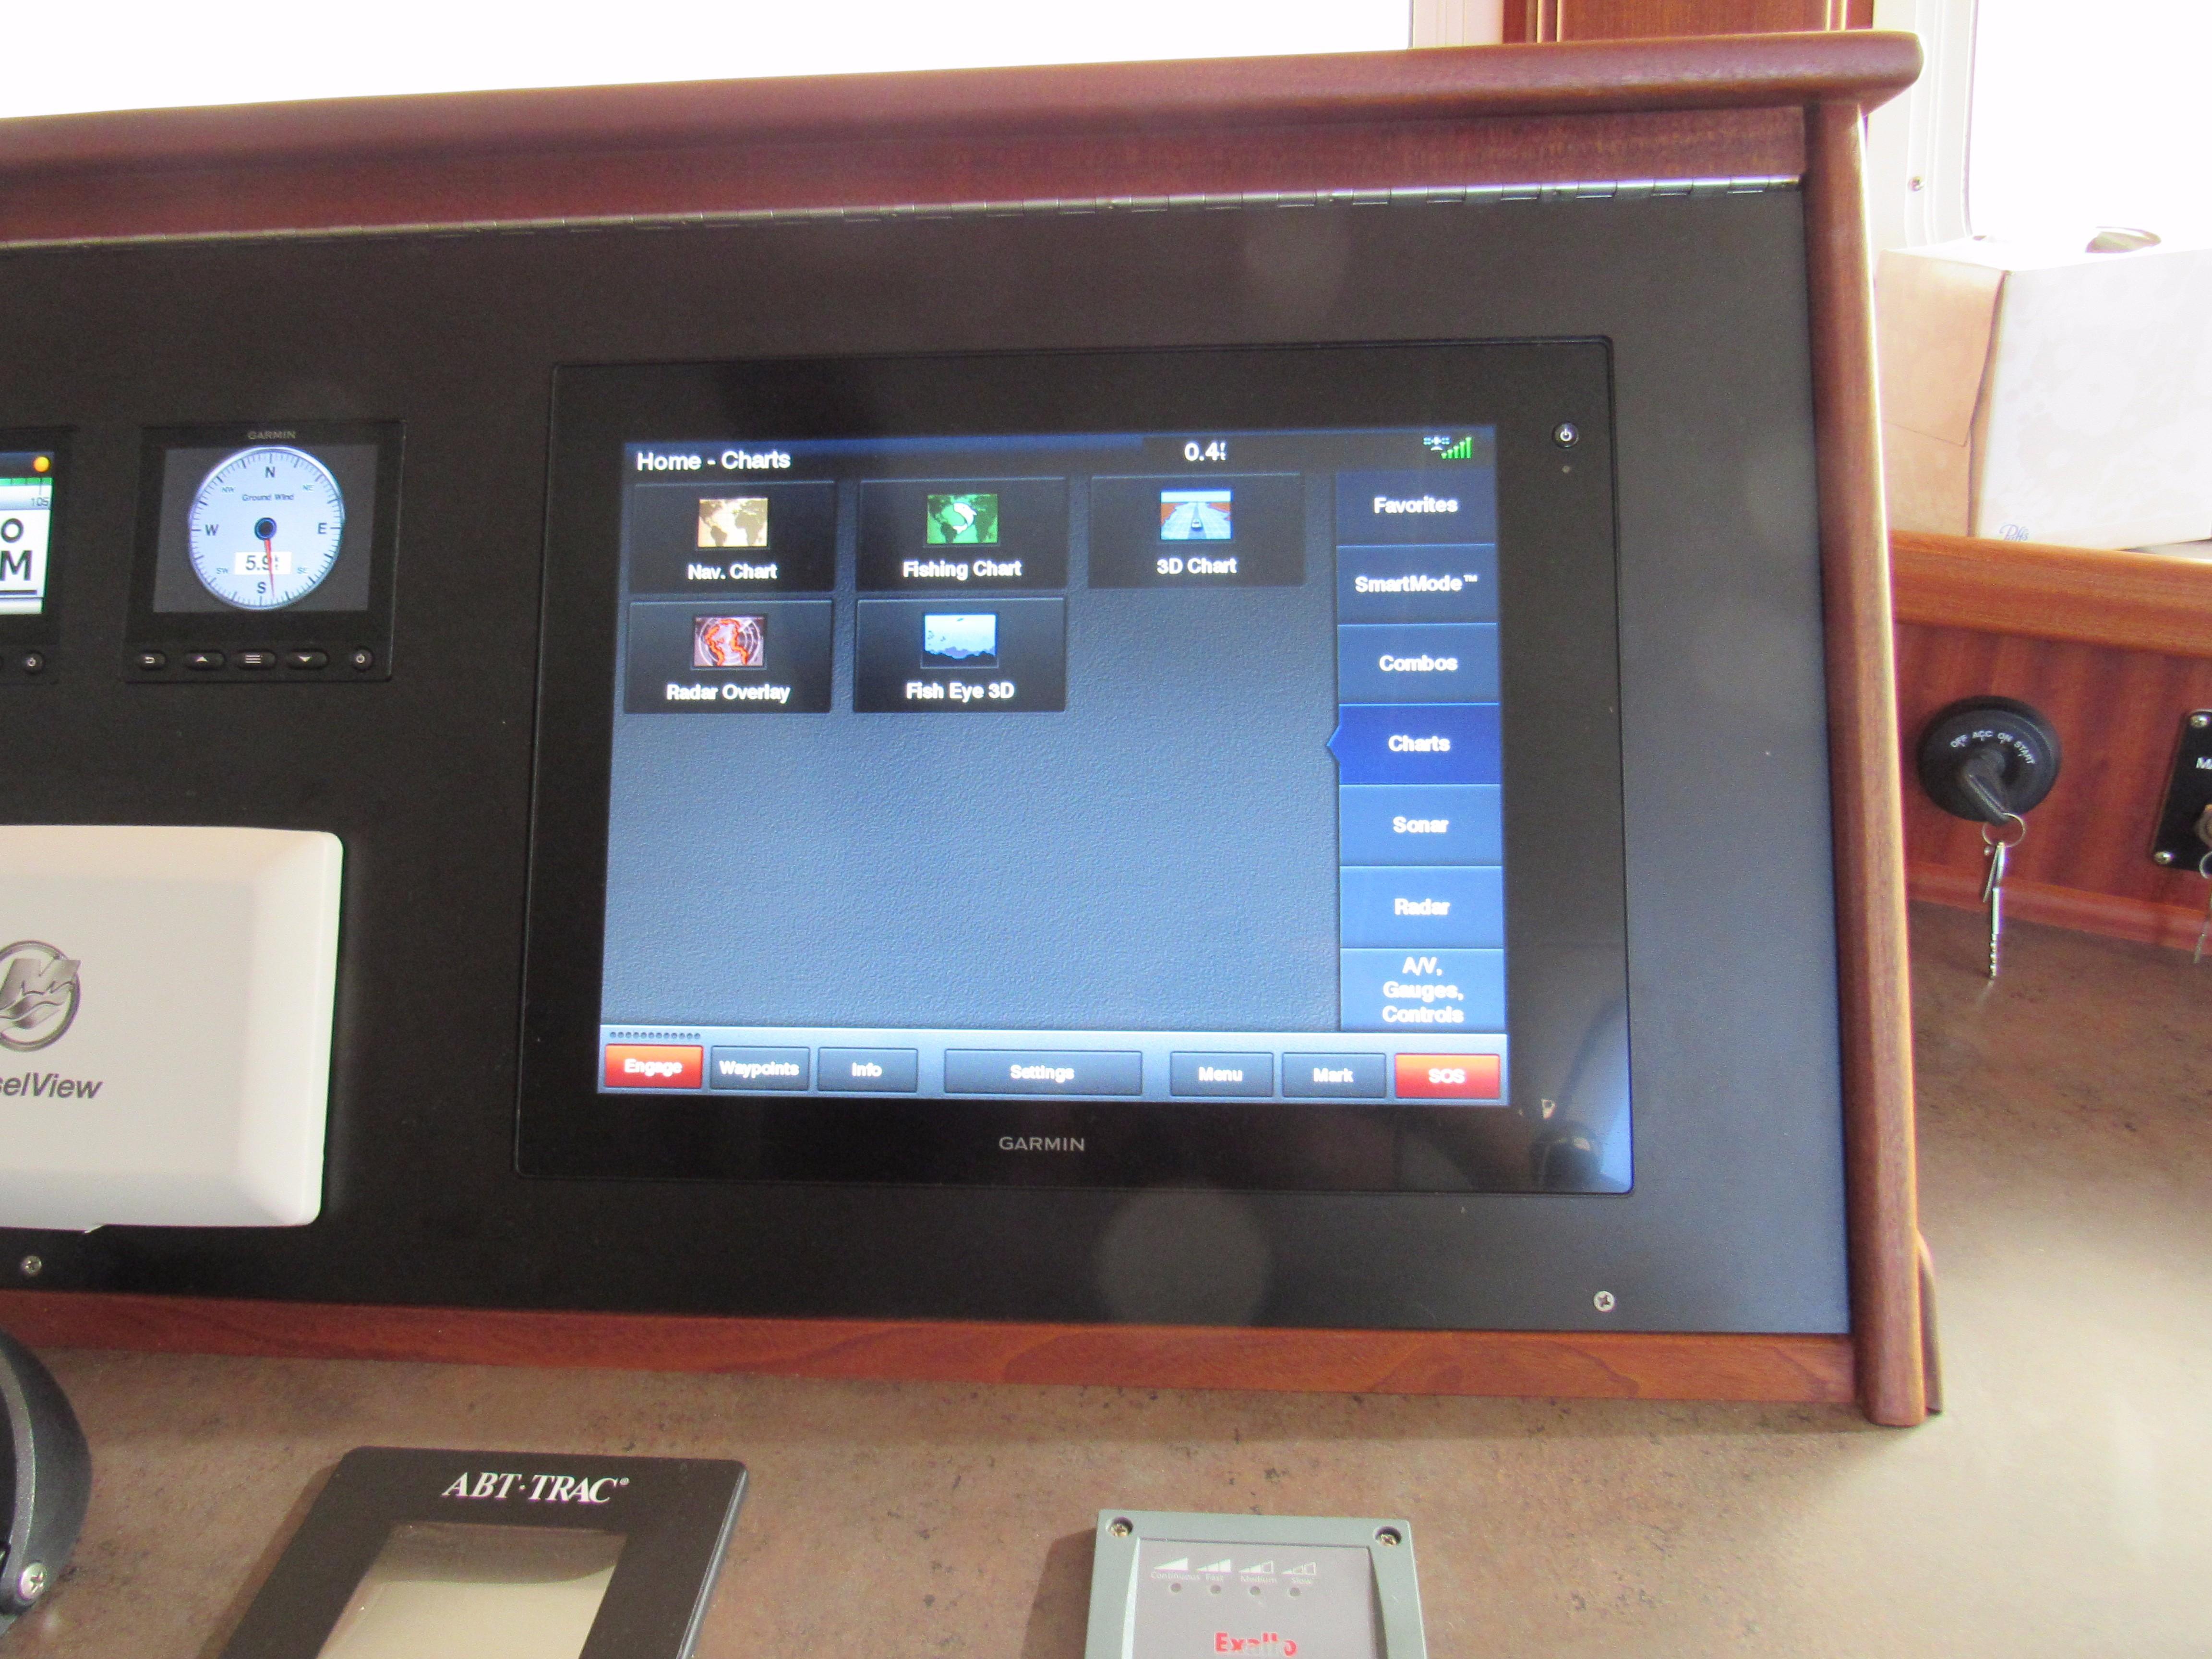 Garmin Touch Screen